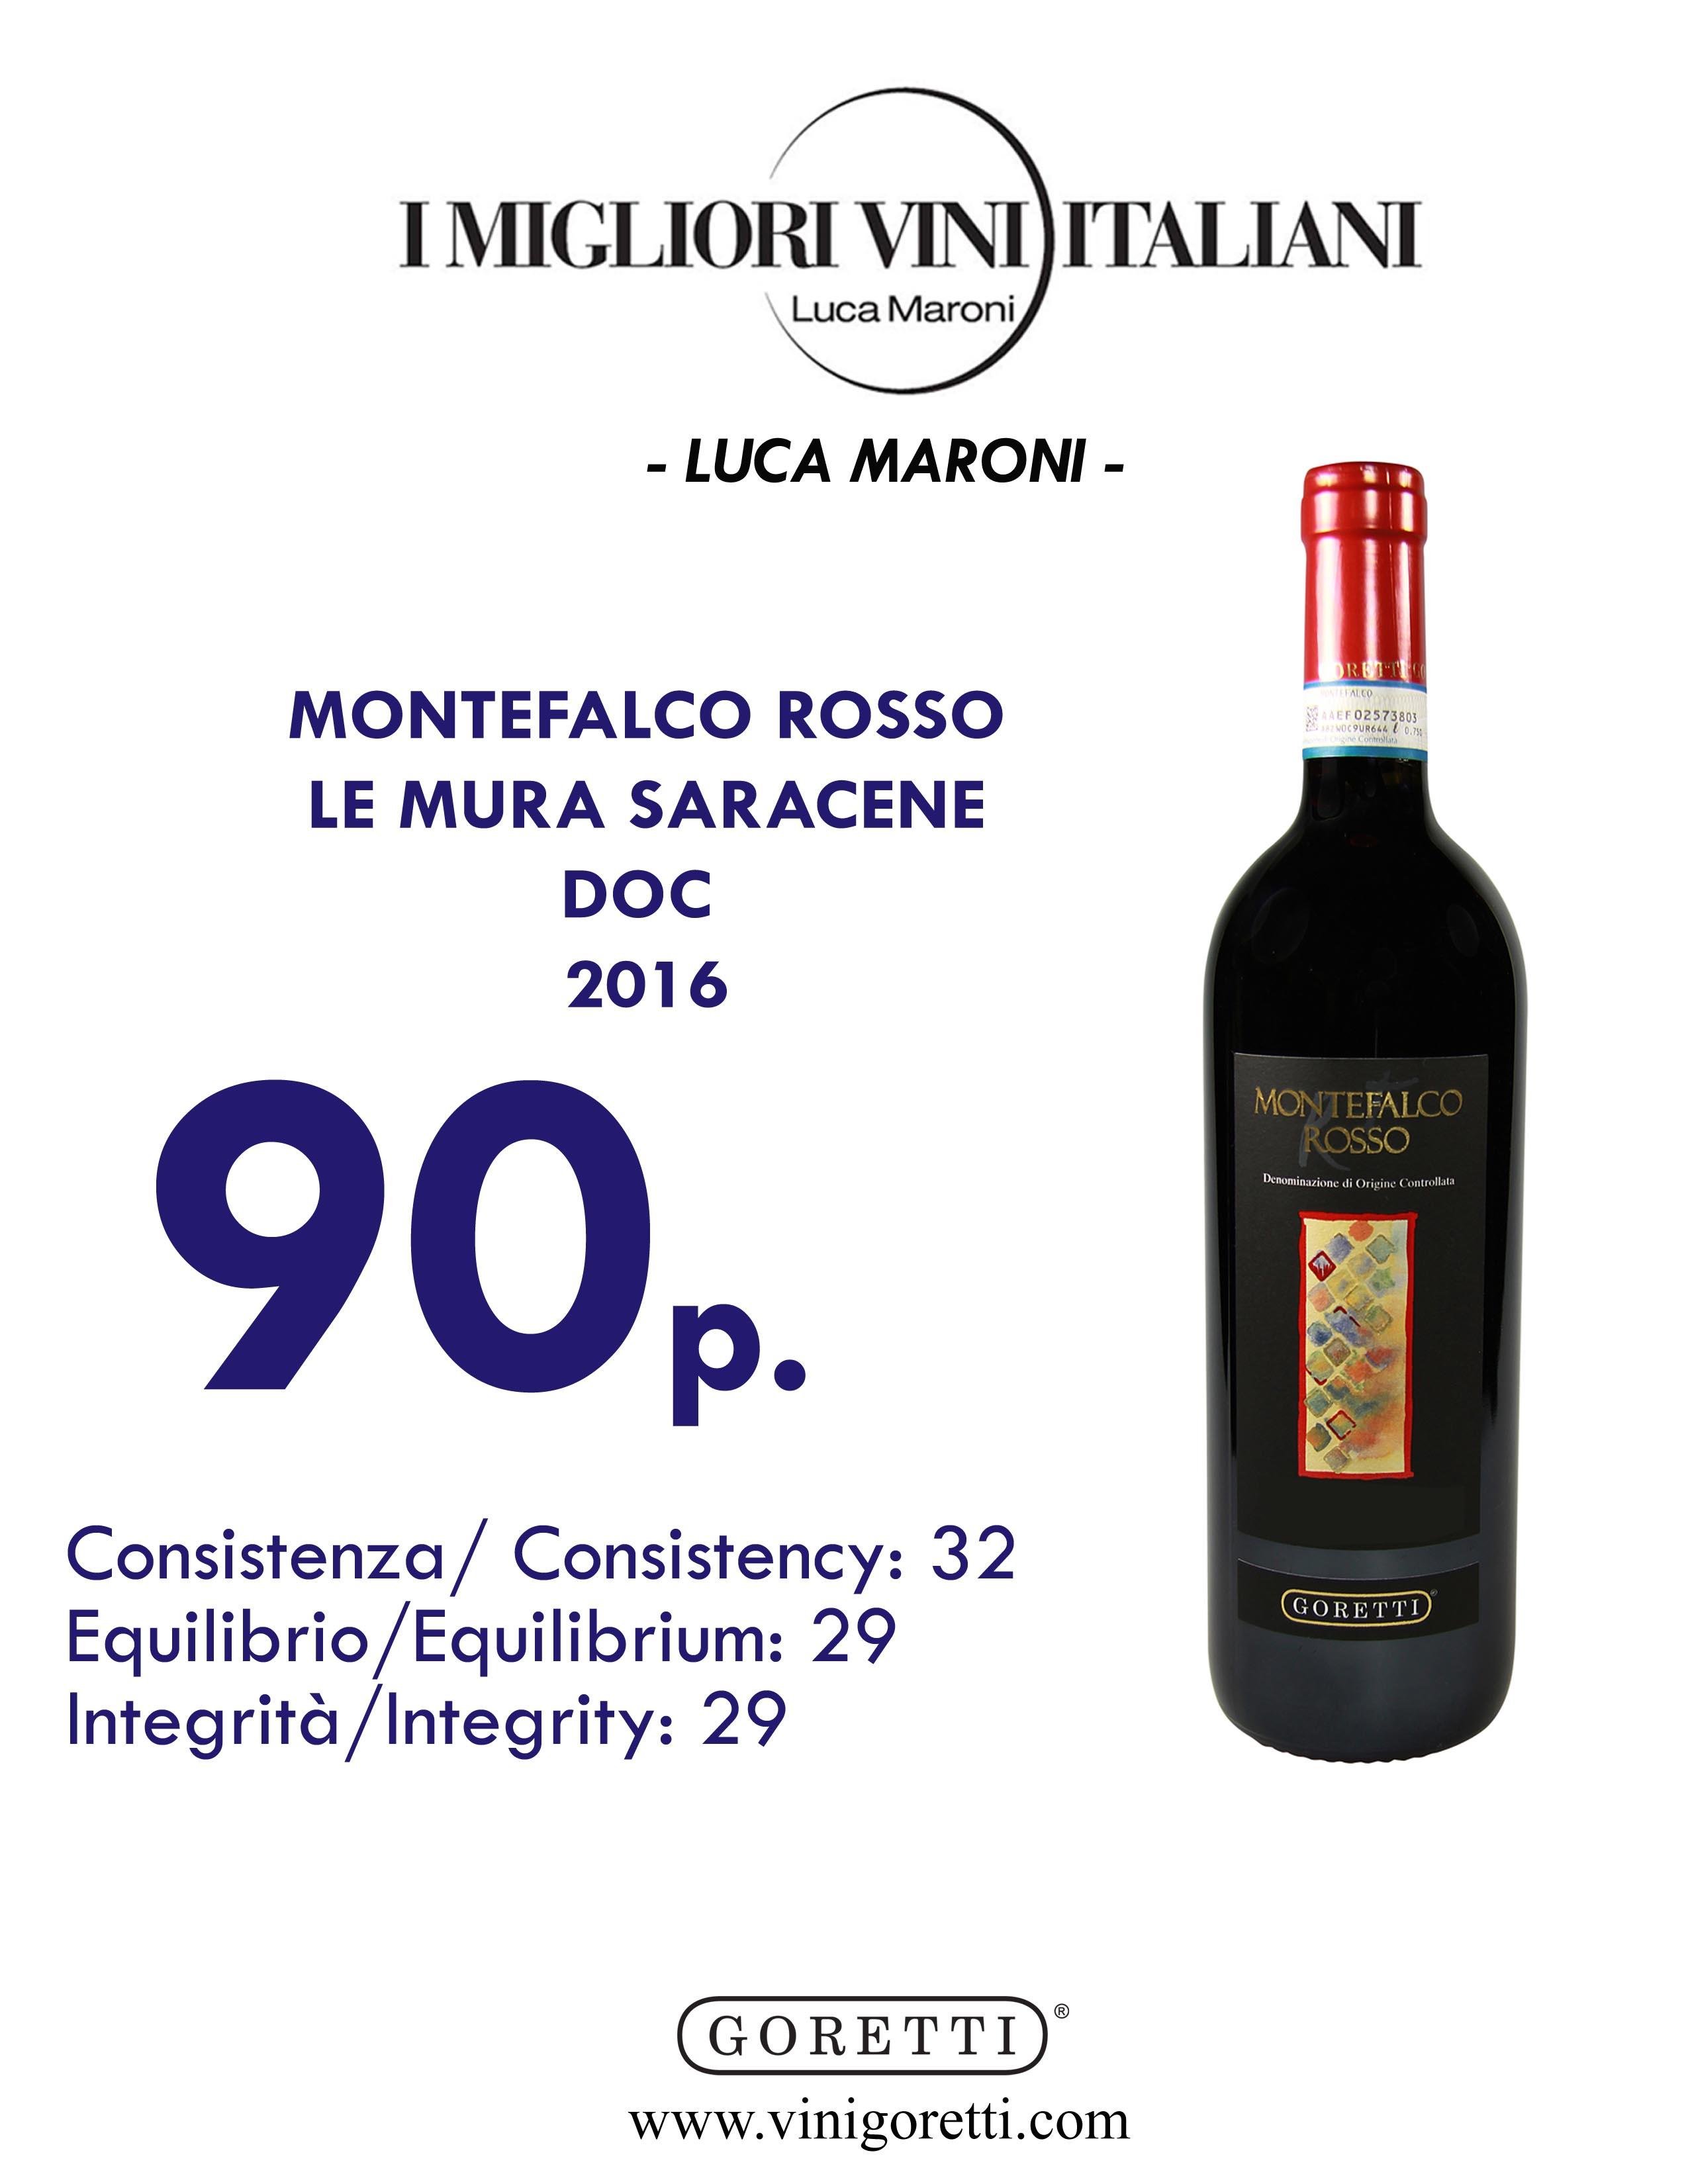 Montefalco Rosso Le Mura Saracene DOC 2016